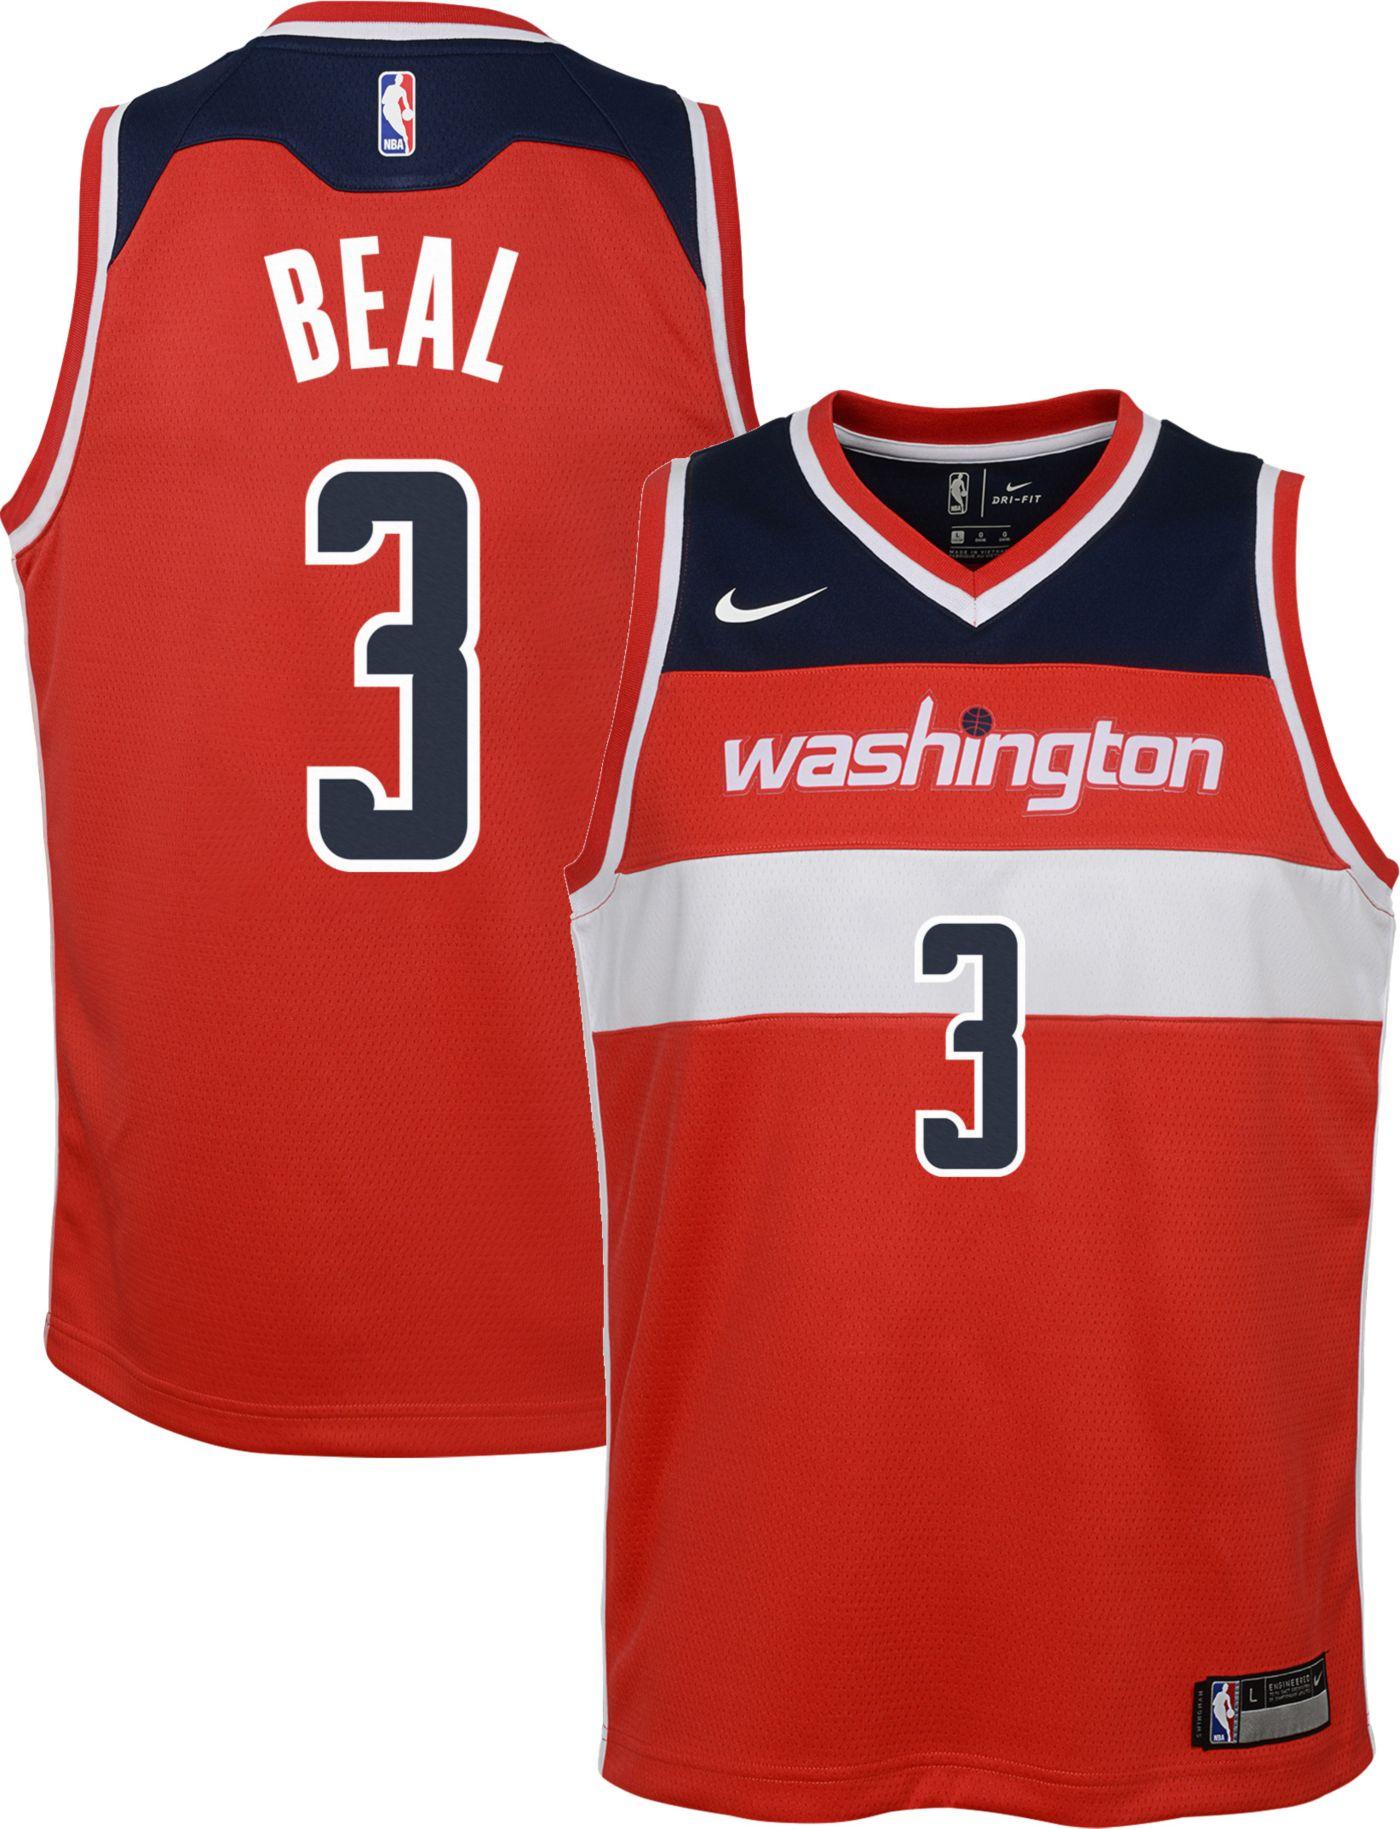 Nike Youth Washington Wizards Bradley Beal #3 Red Dri-FIT Swingman Jersey